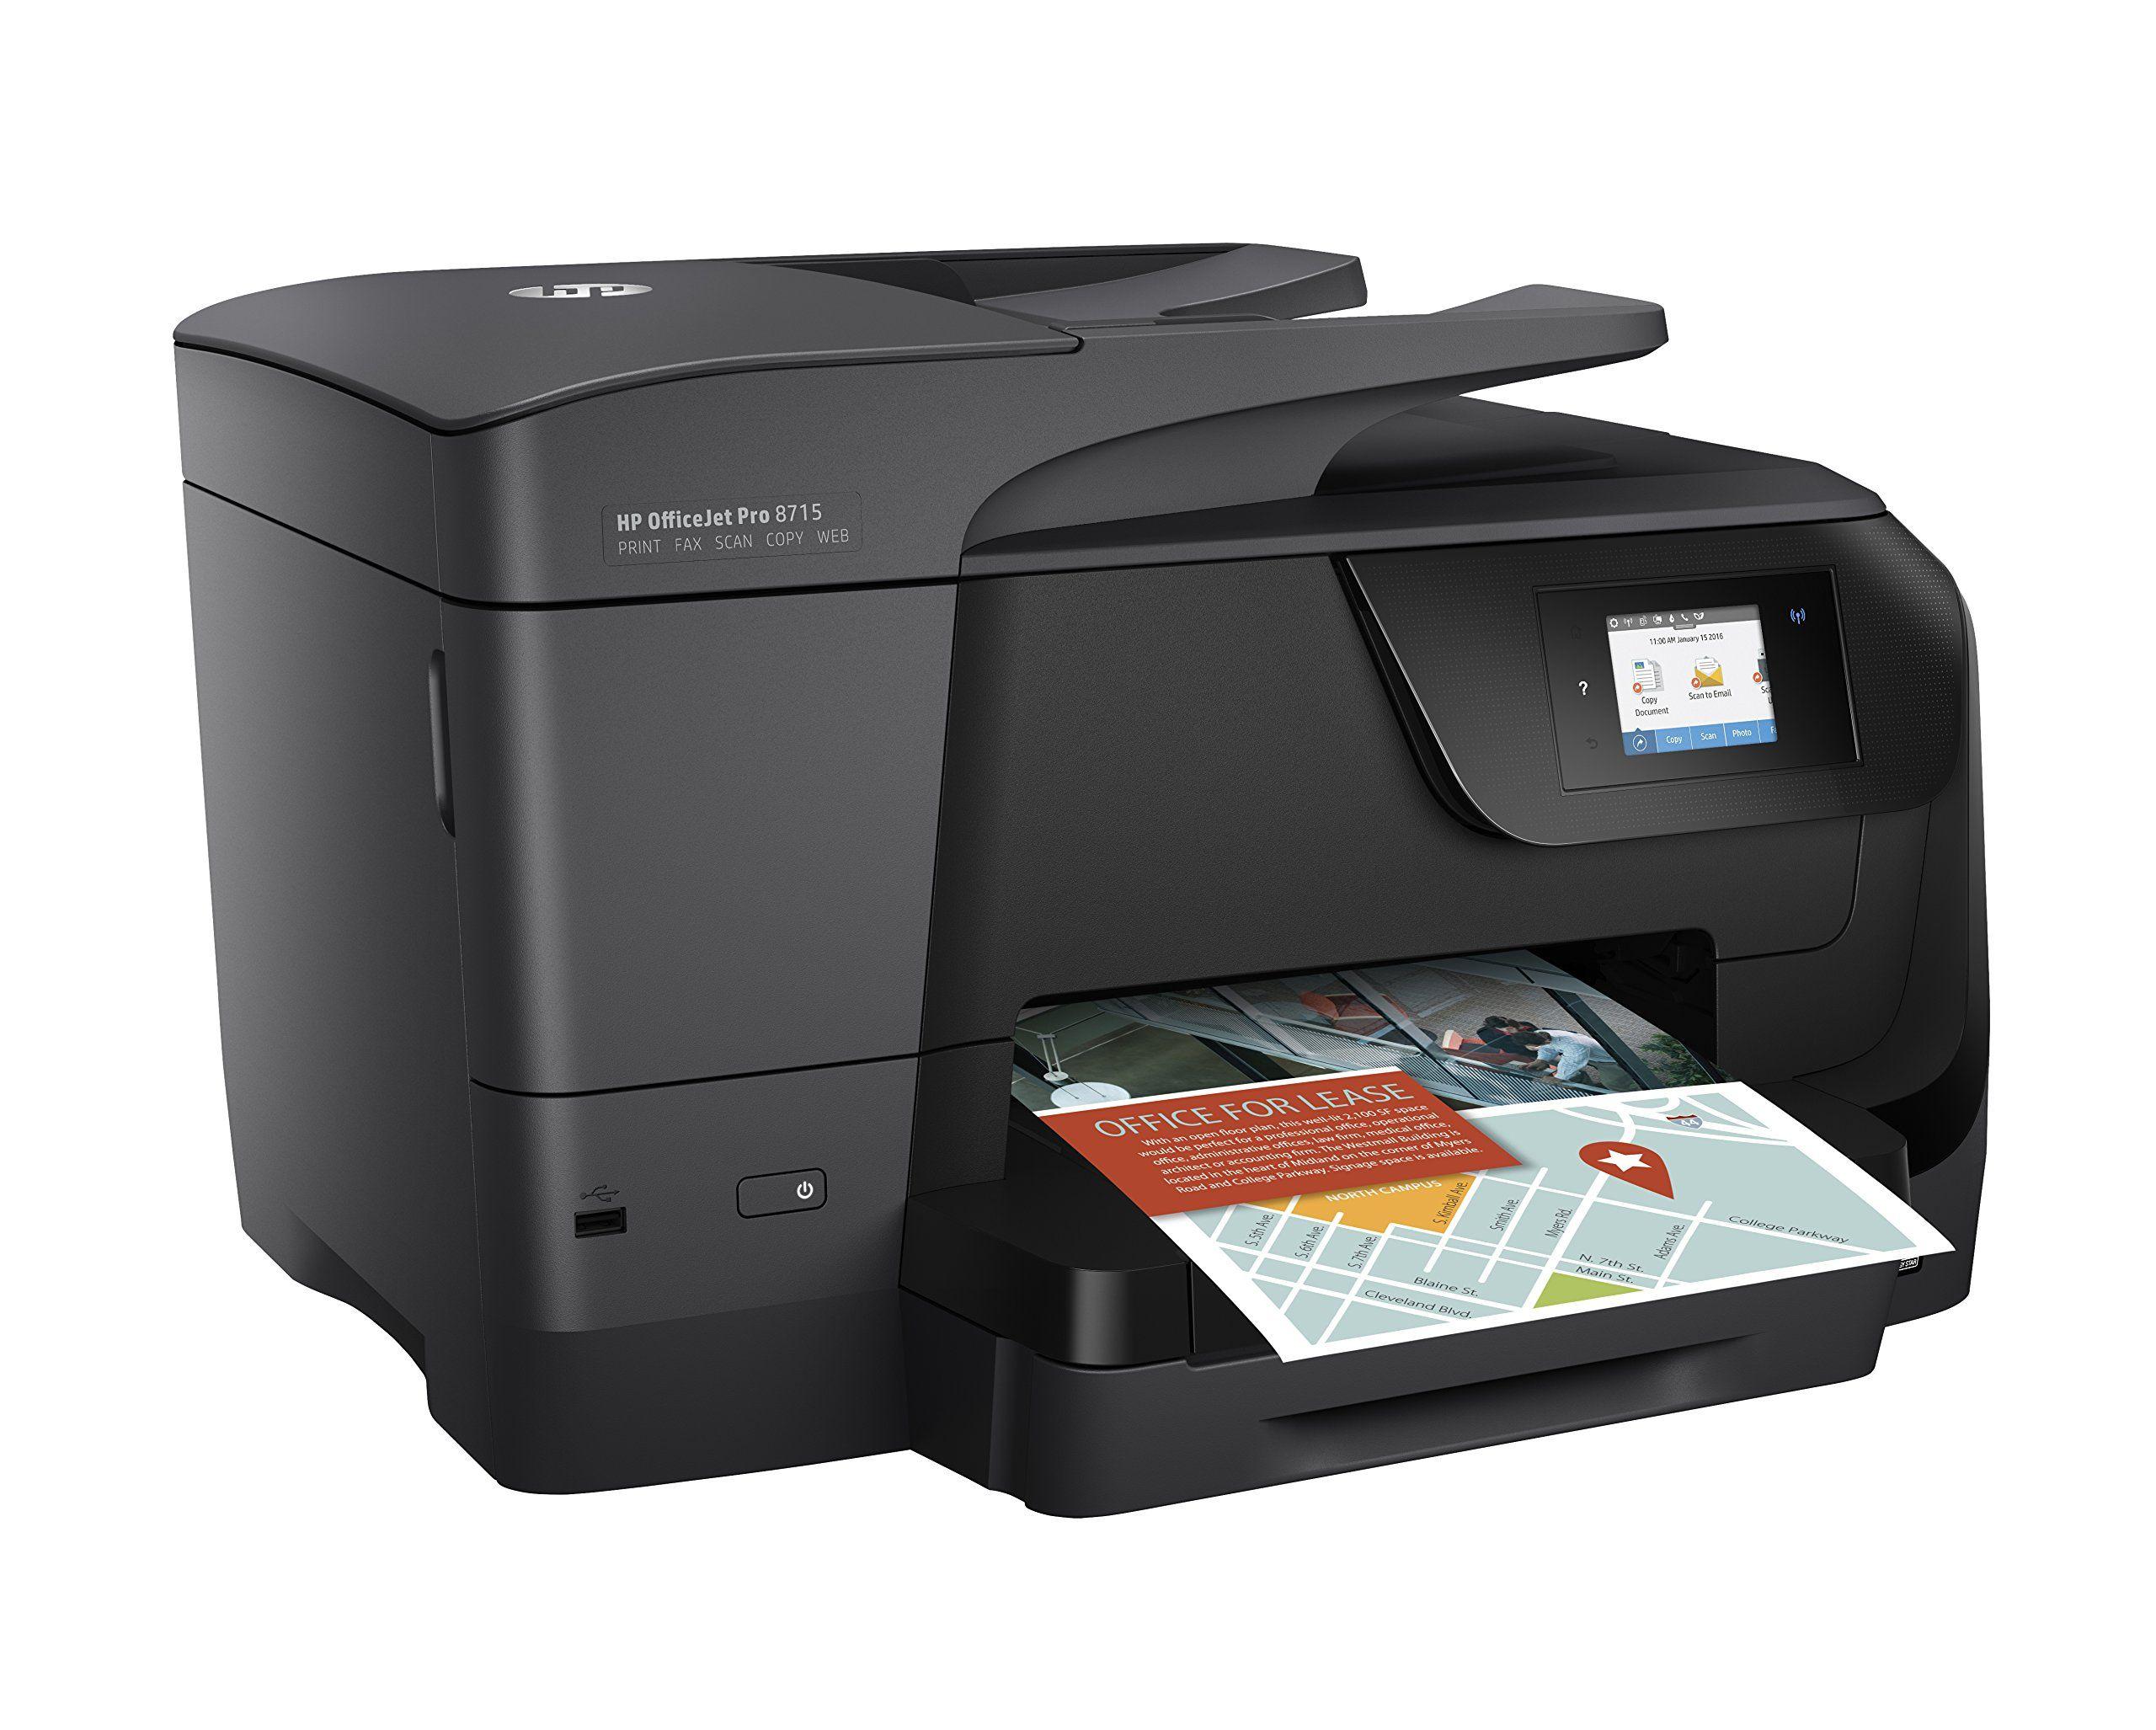 Hp Officejet Pro 8715 Allinone Multifunction Printer Thermal Inkjet Print Copy Scanner Fax Be Sure To Check Out T Hp Officejet Pro Hp Officejet Hp Printer